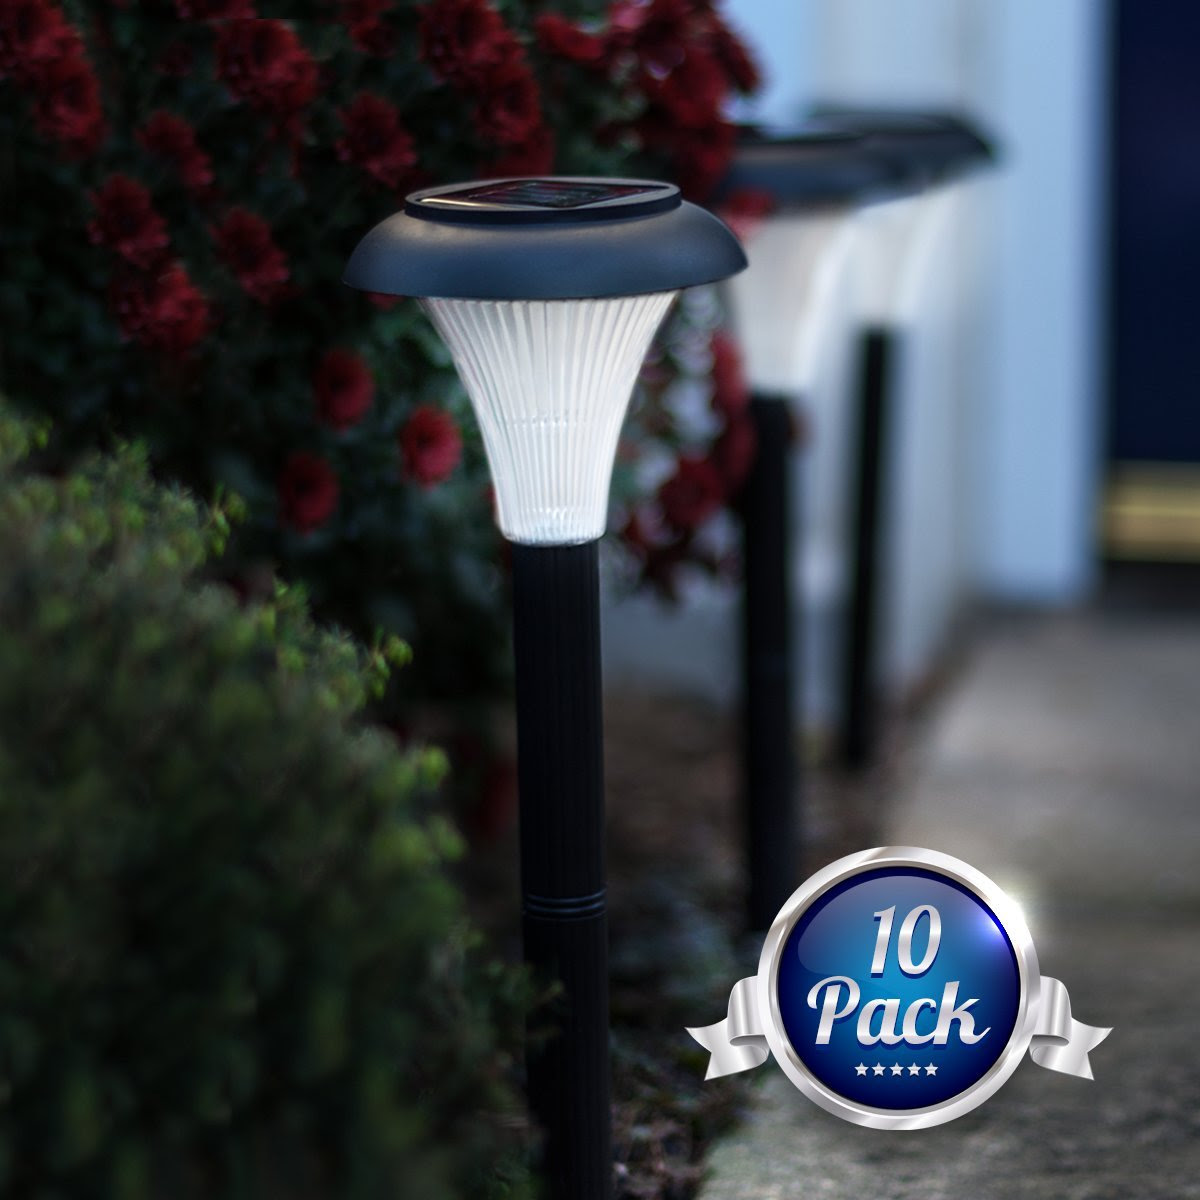 Solar LED Outdoor Light Set Of 10 Garden Lighting Path Yard Patio Lamp Decor New  eBay